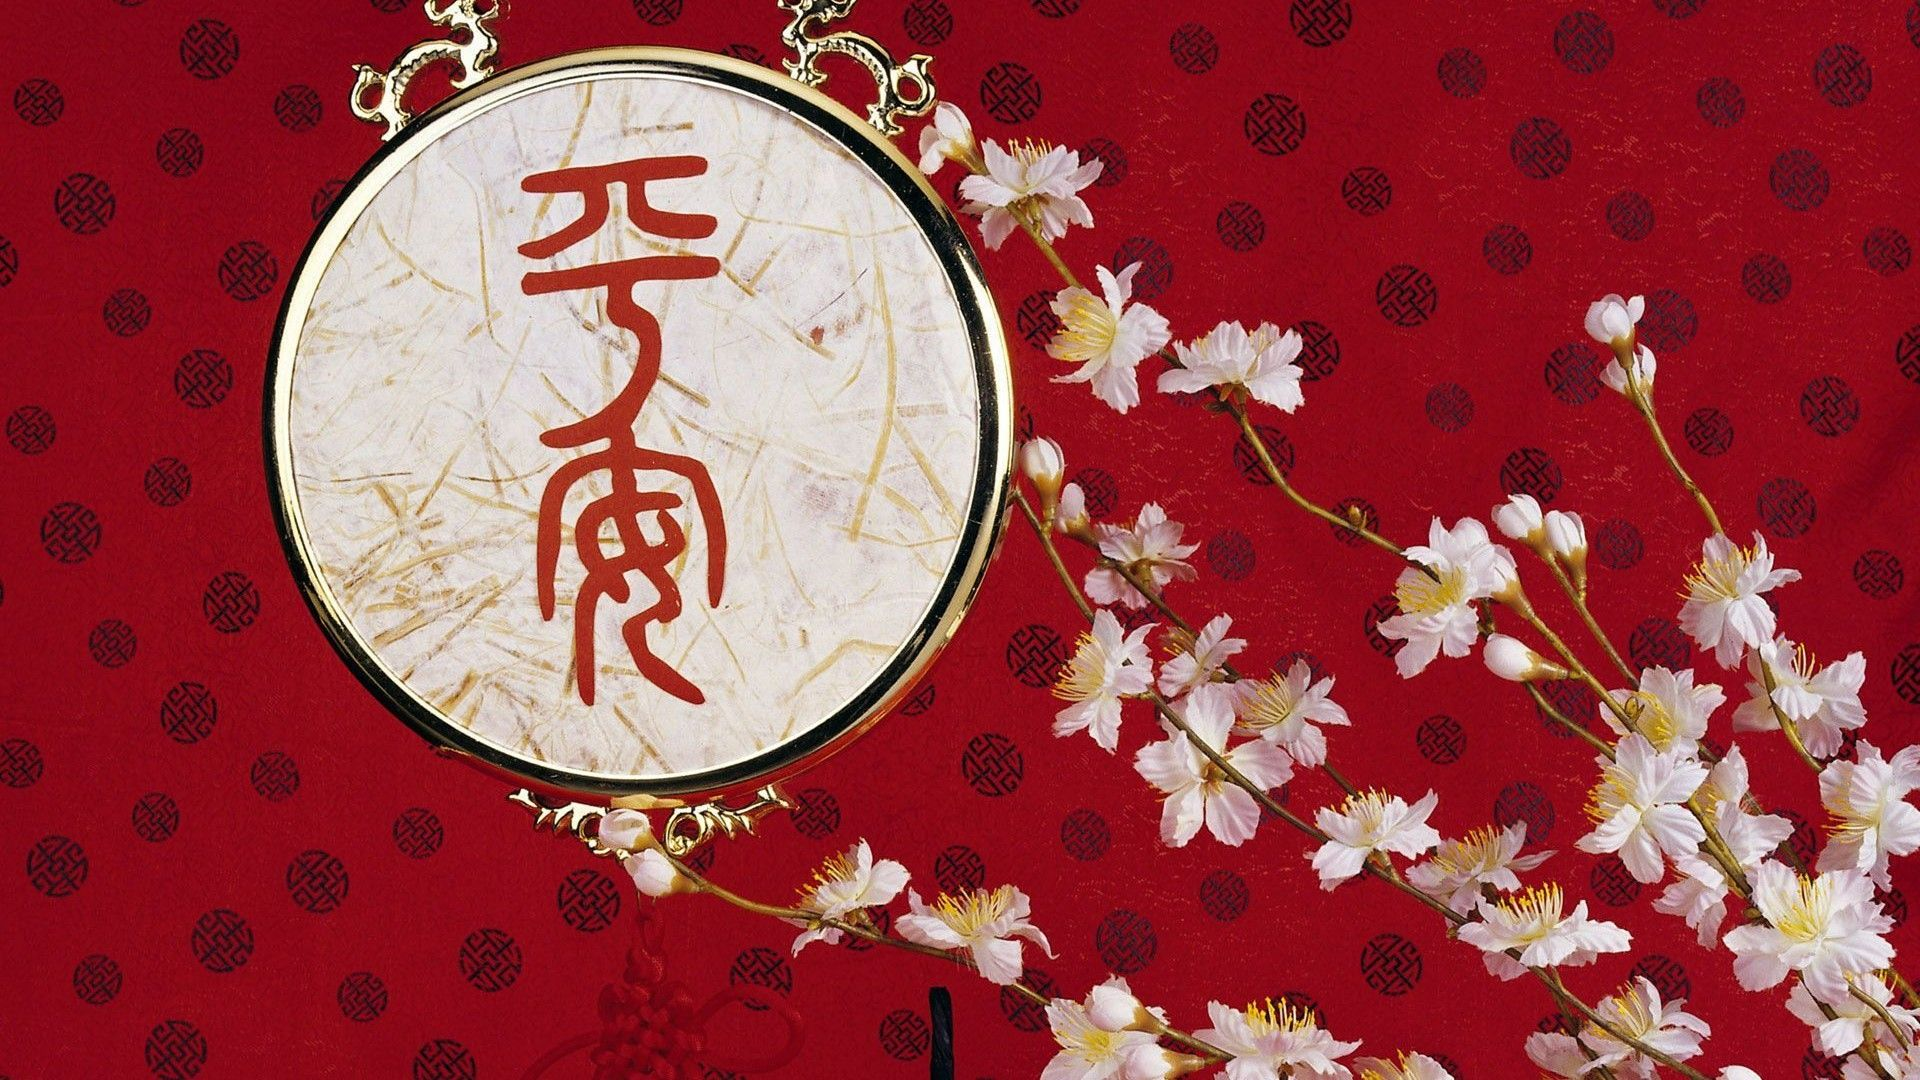 Chinese New Year wallpaper photo full hd